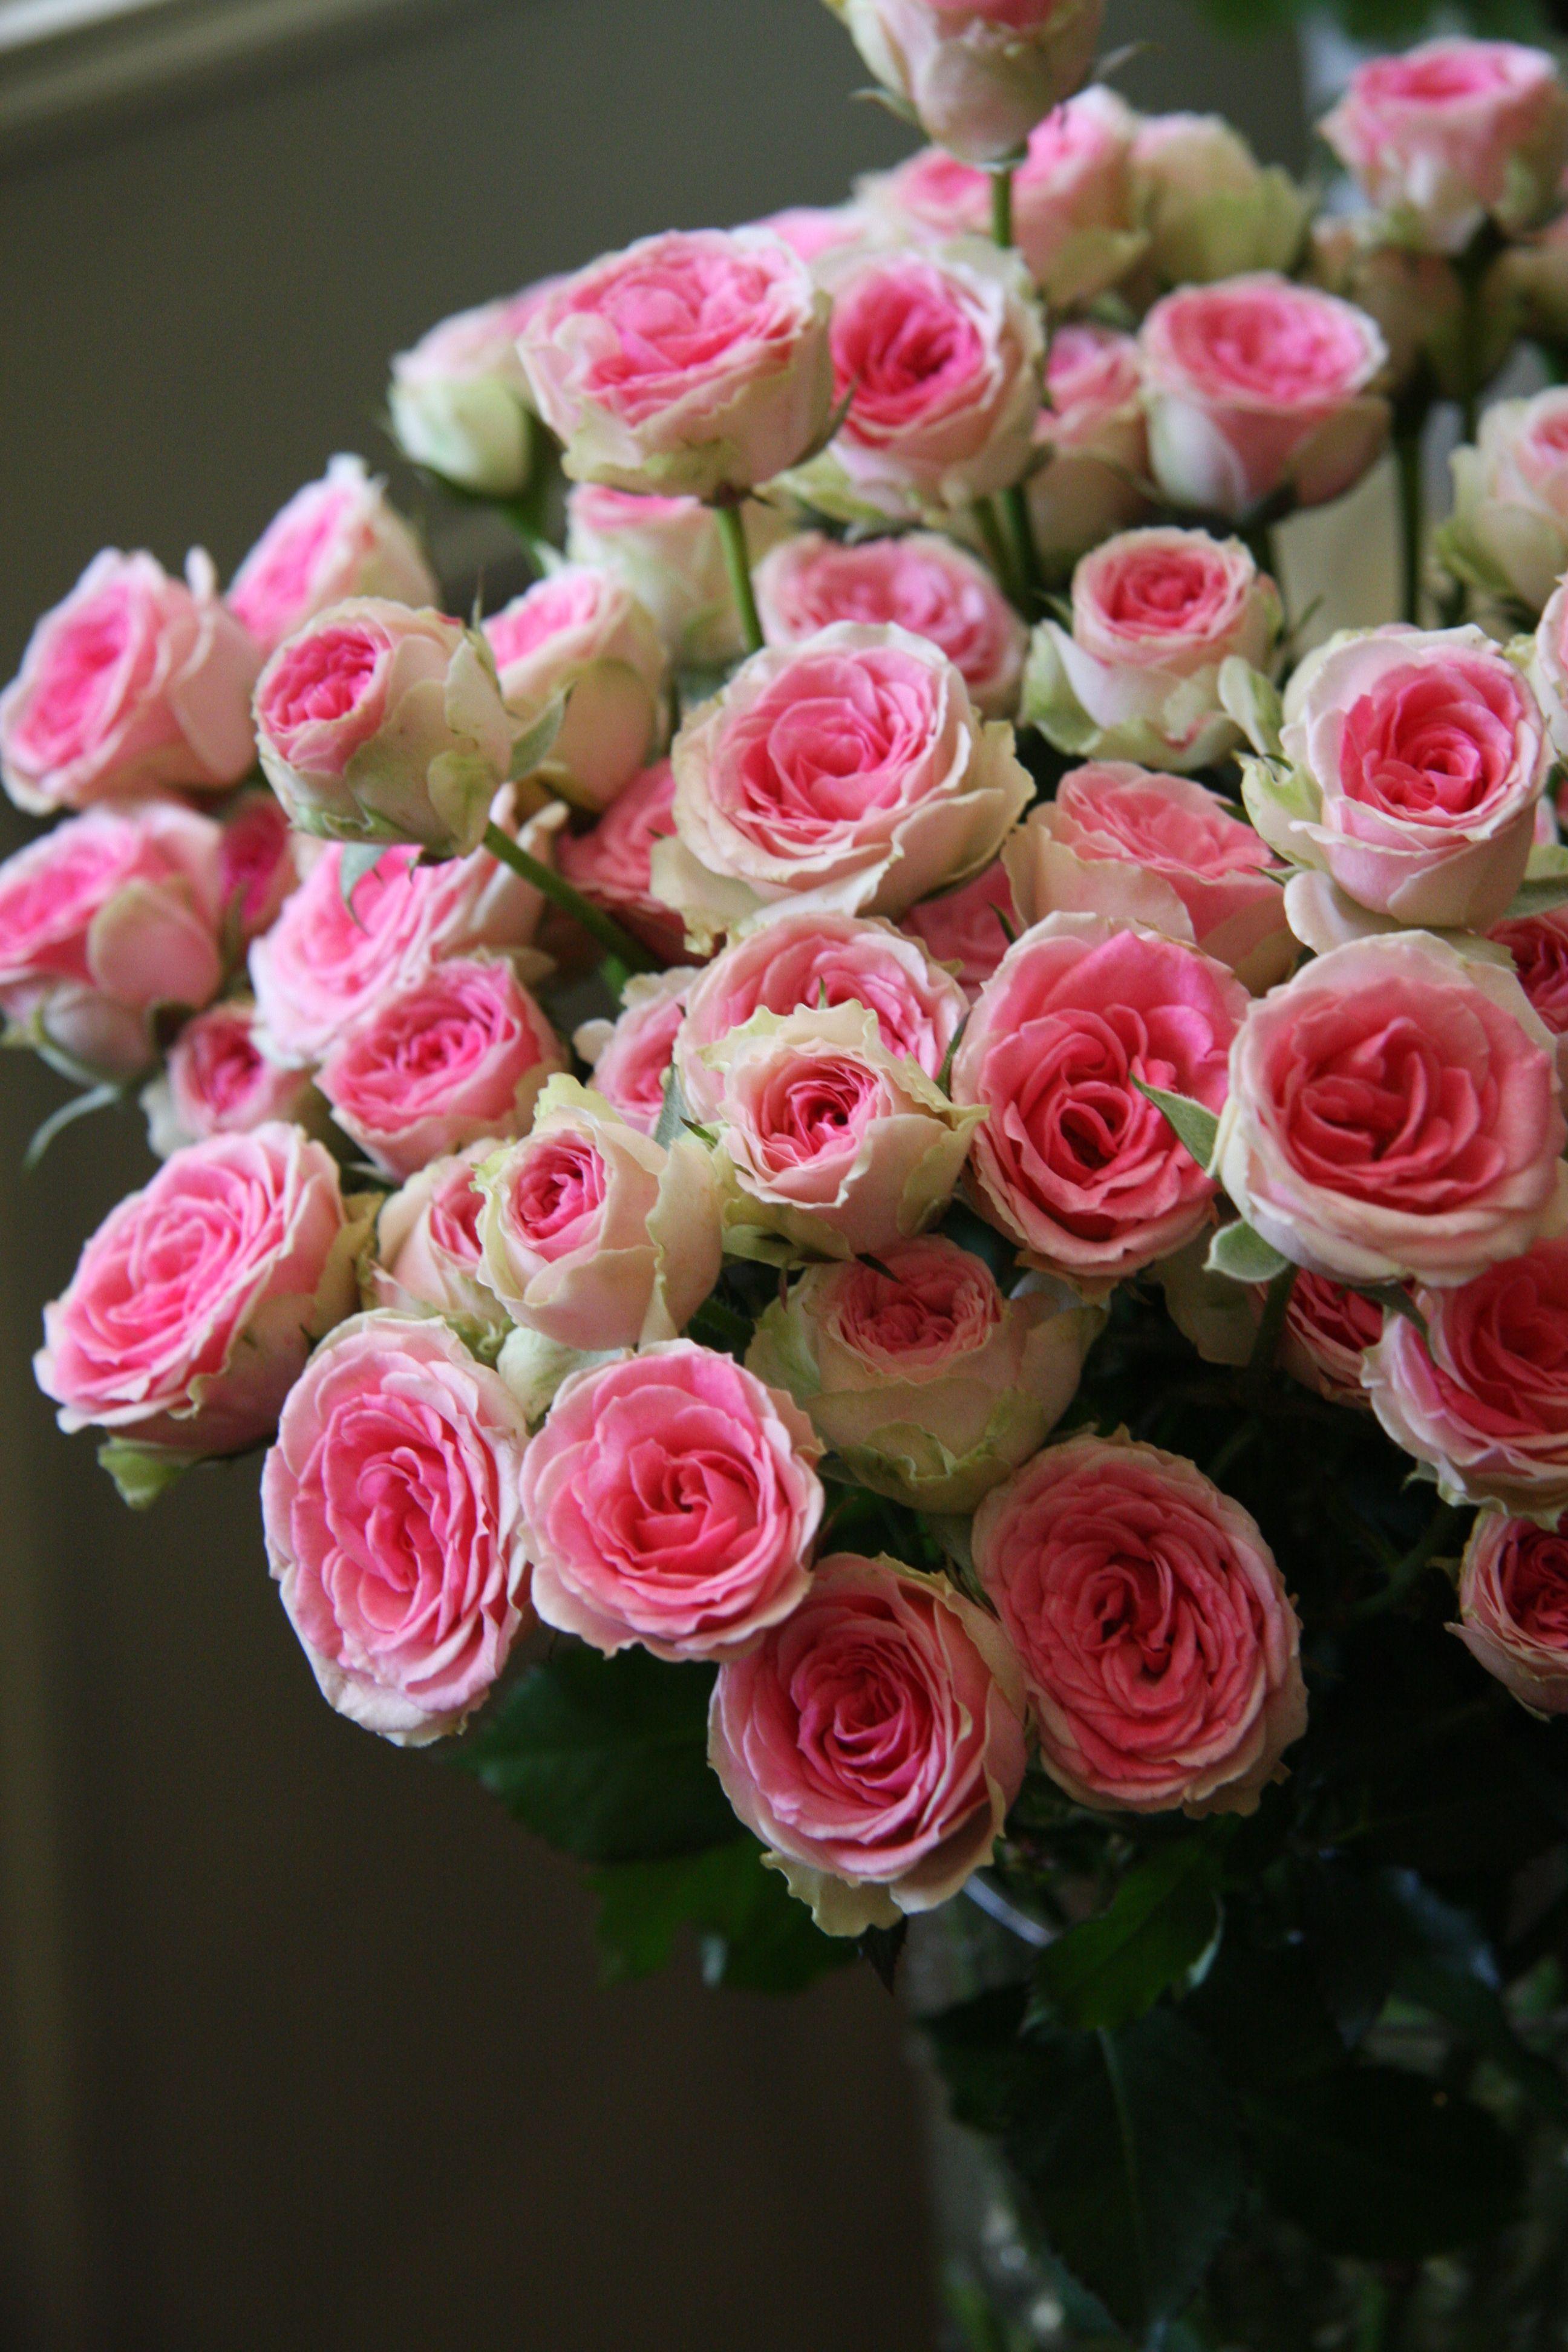 39 mimi eden 39 florists rose mini flora bred by alain. Black Bedroom Furniture Sets. Home Design Ideas